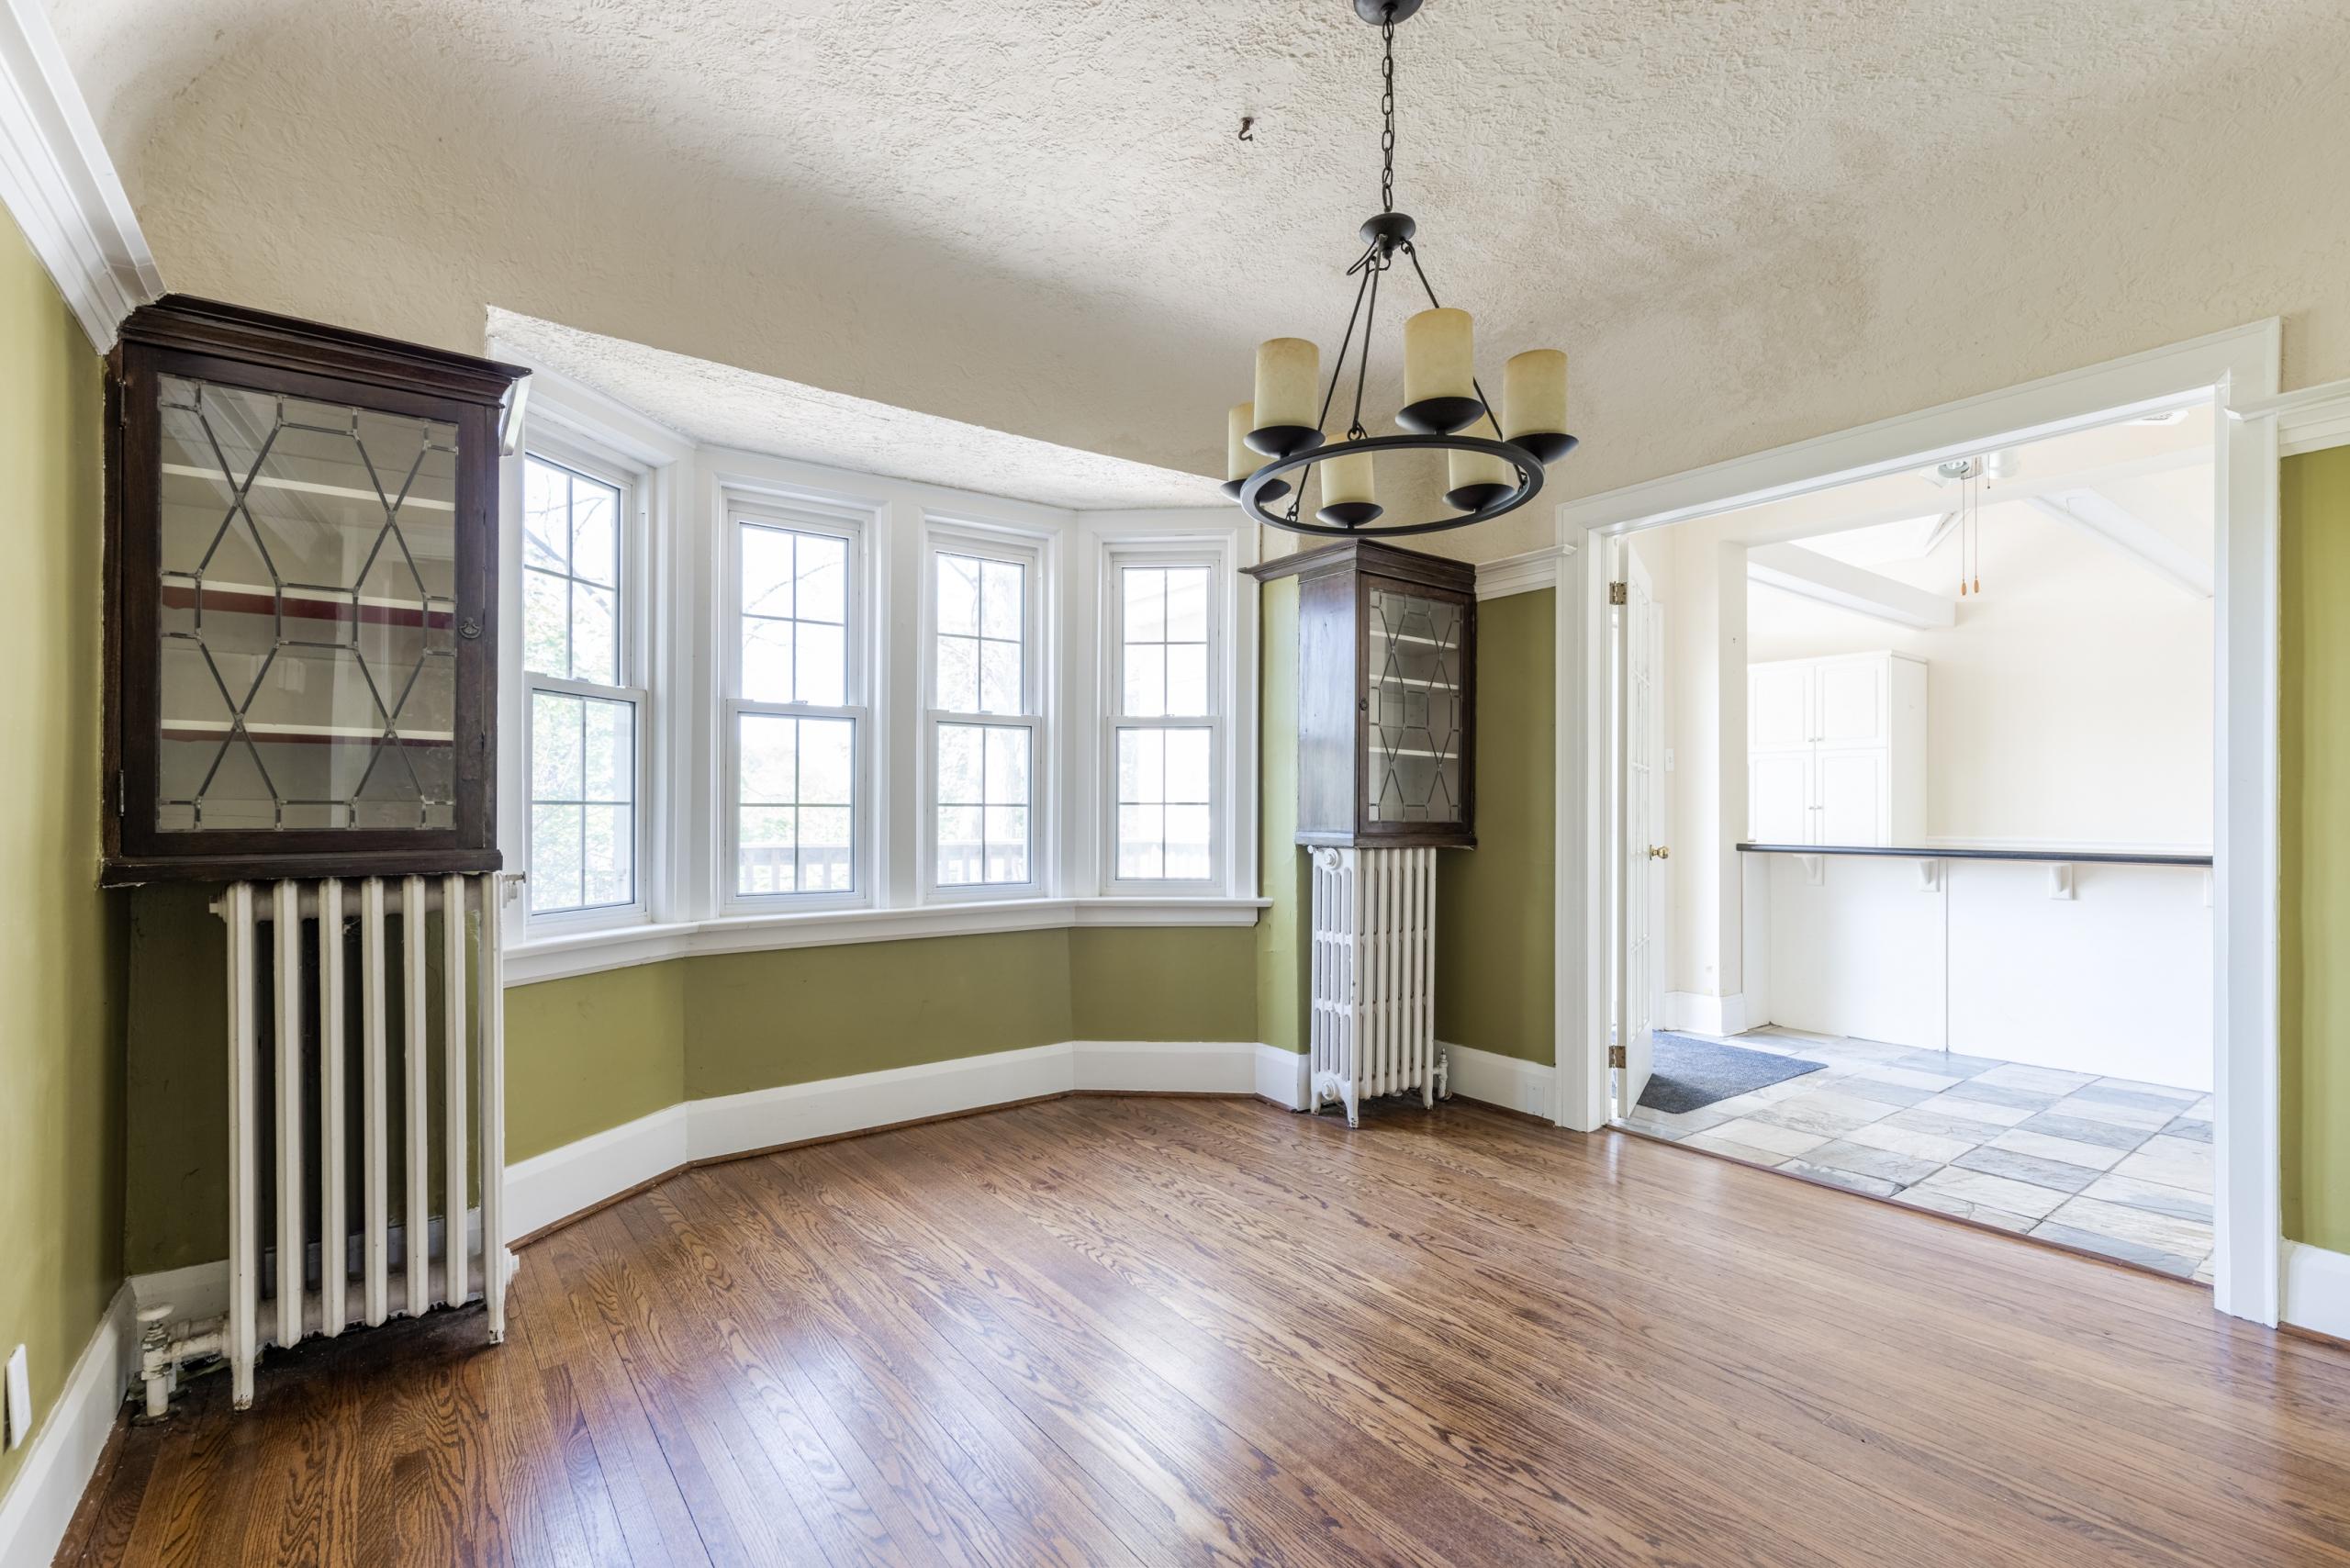 Living room featured at 416 Trafalgar Road, Oakville at Alex Irish & Associates